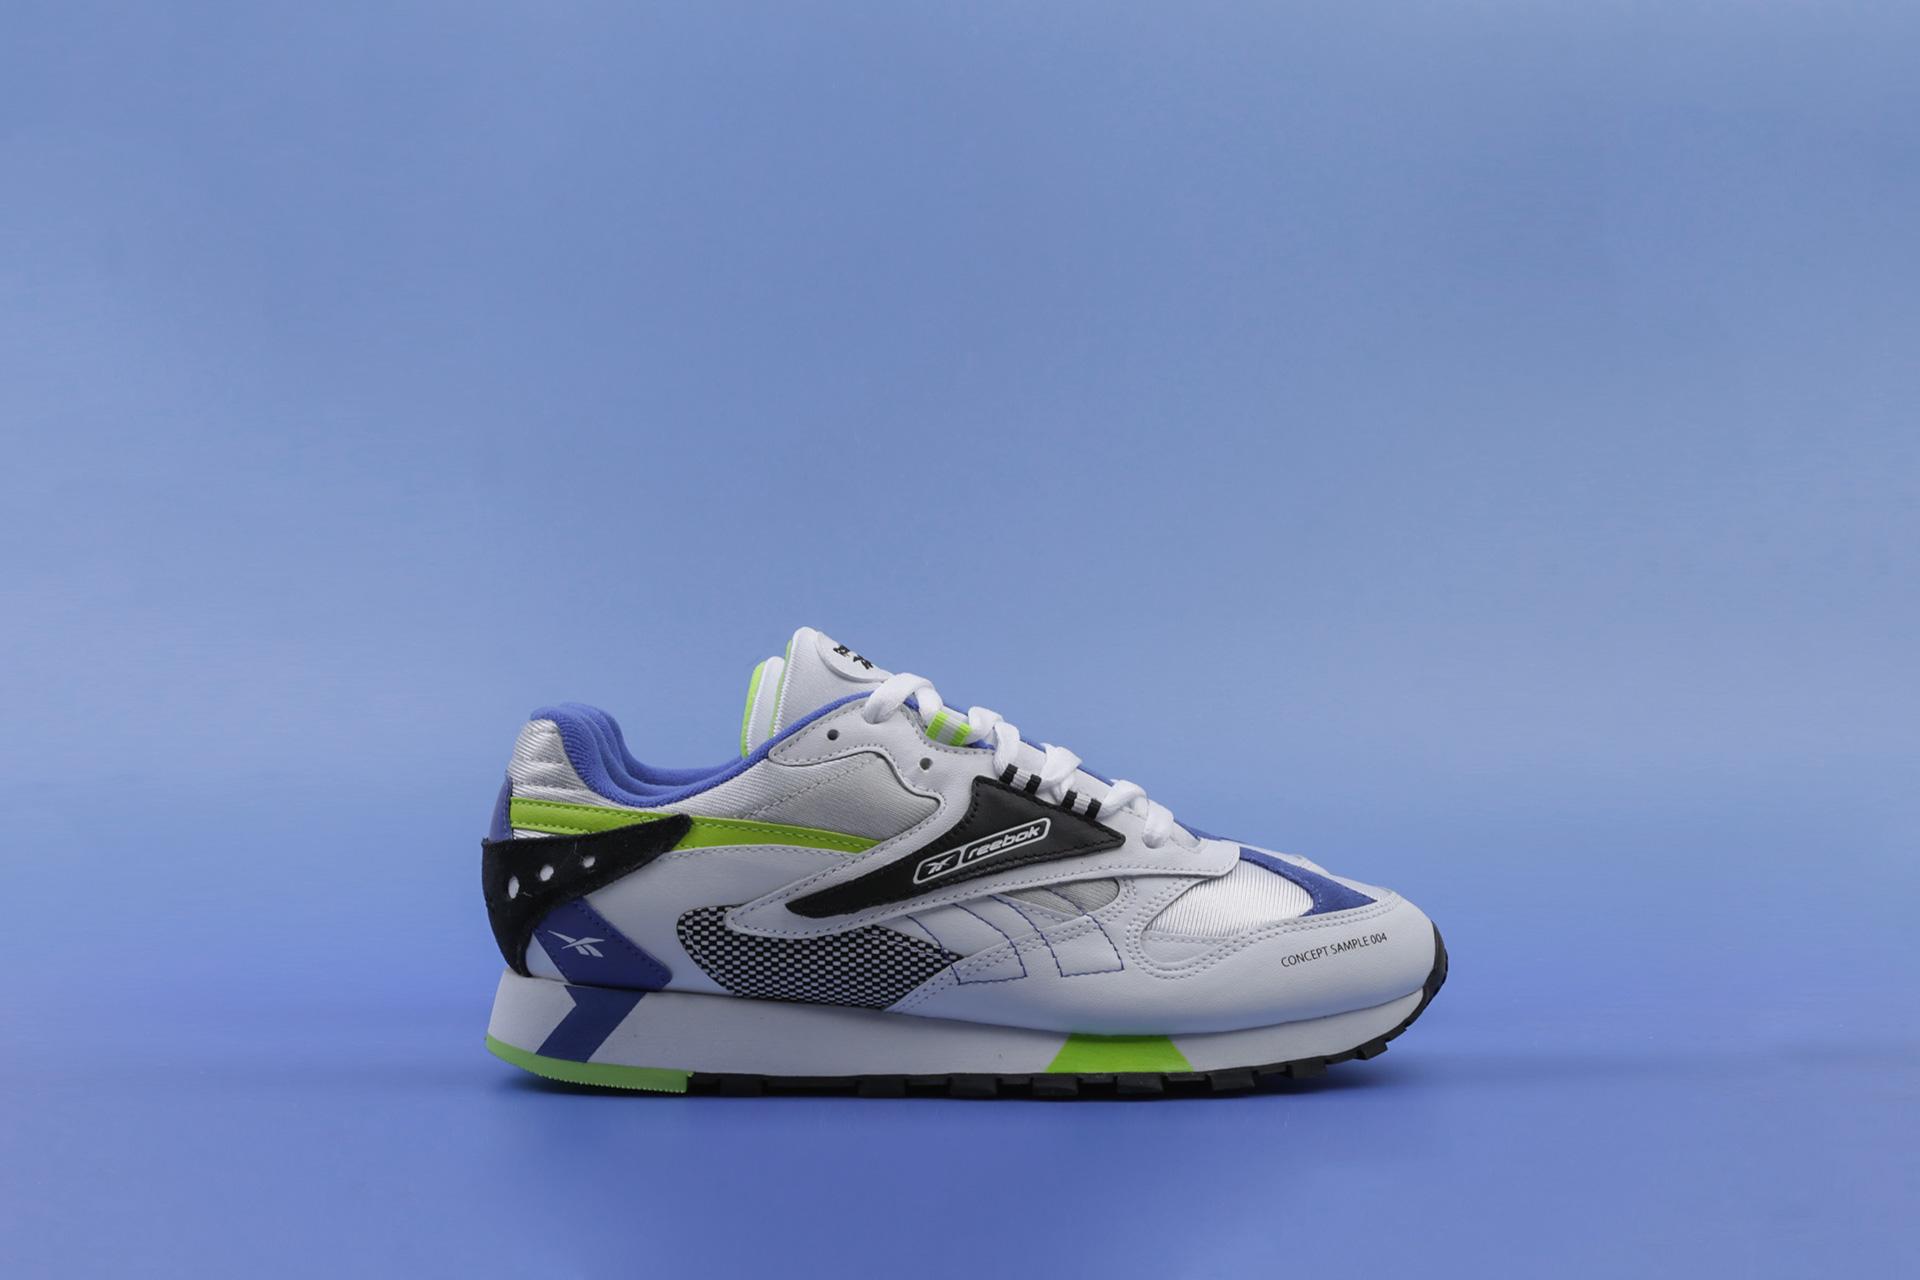 9885e392 Купить белые мужские кроссовки Classic Leather ATI 90S от Reebok ...